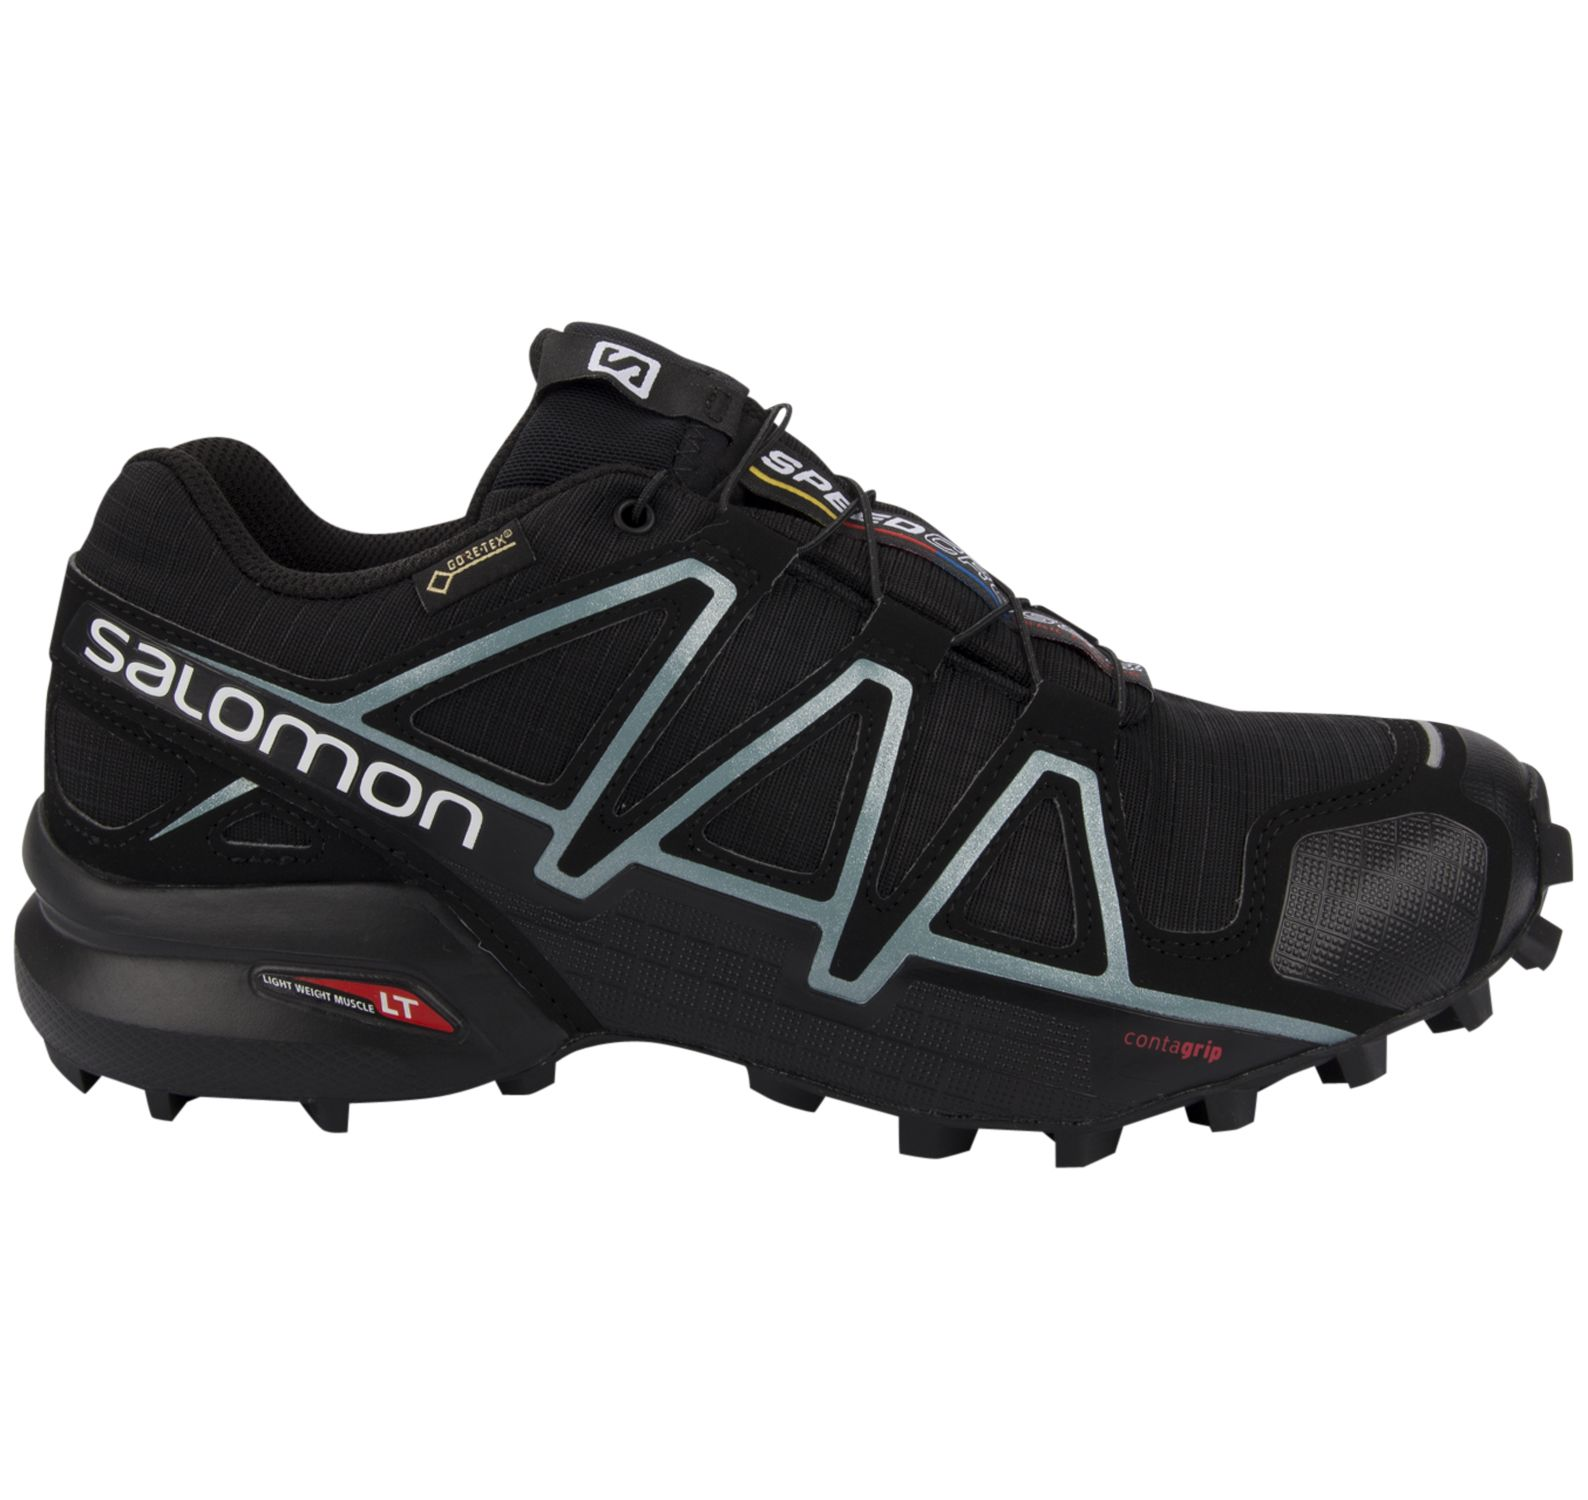 speedcross 4 gtx® w, black/black/metallicbubbleblue, 37 1/3